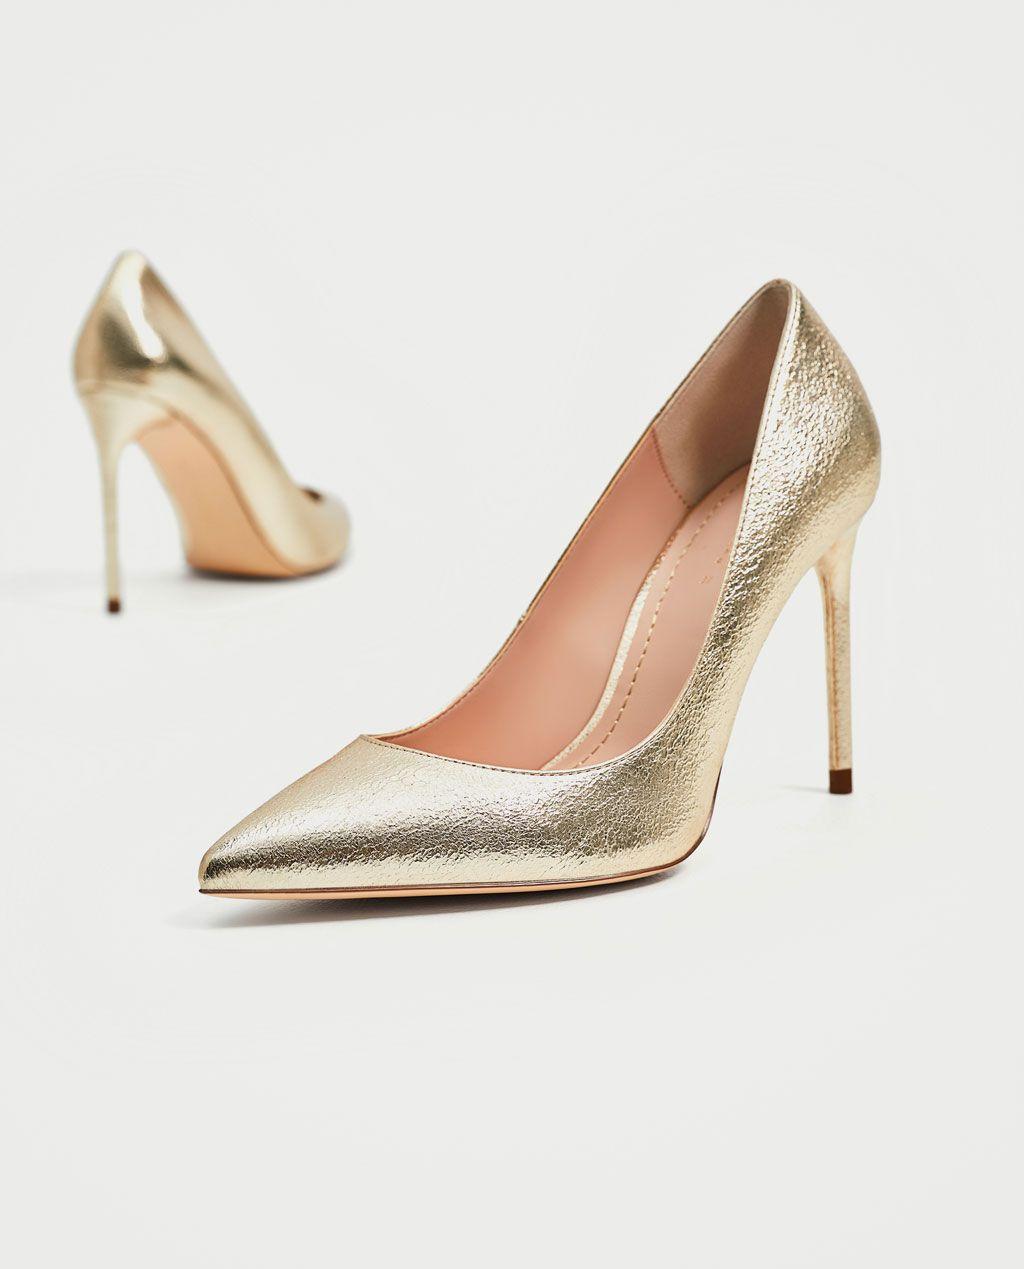 Shoes Y Ropa Heels Shoes Court Dorado High Salón Pinterest 4PXnqYwf